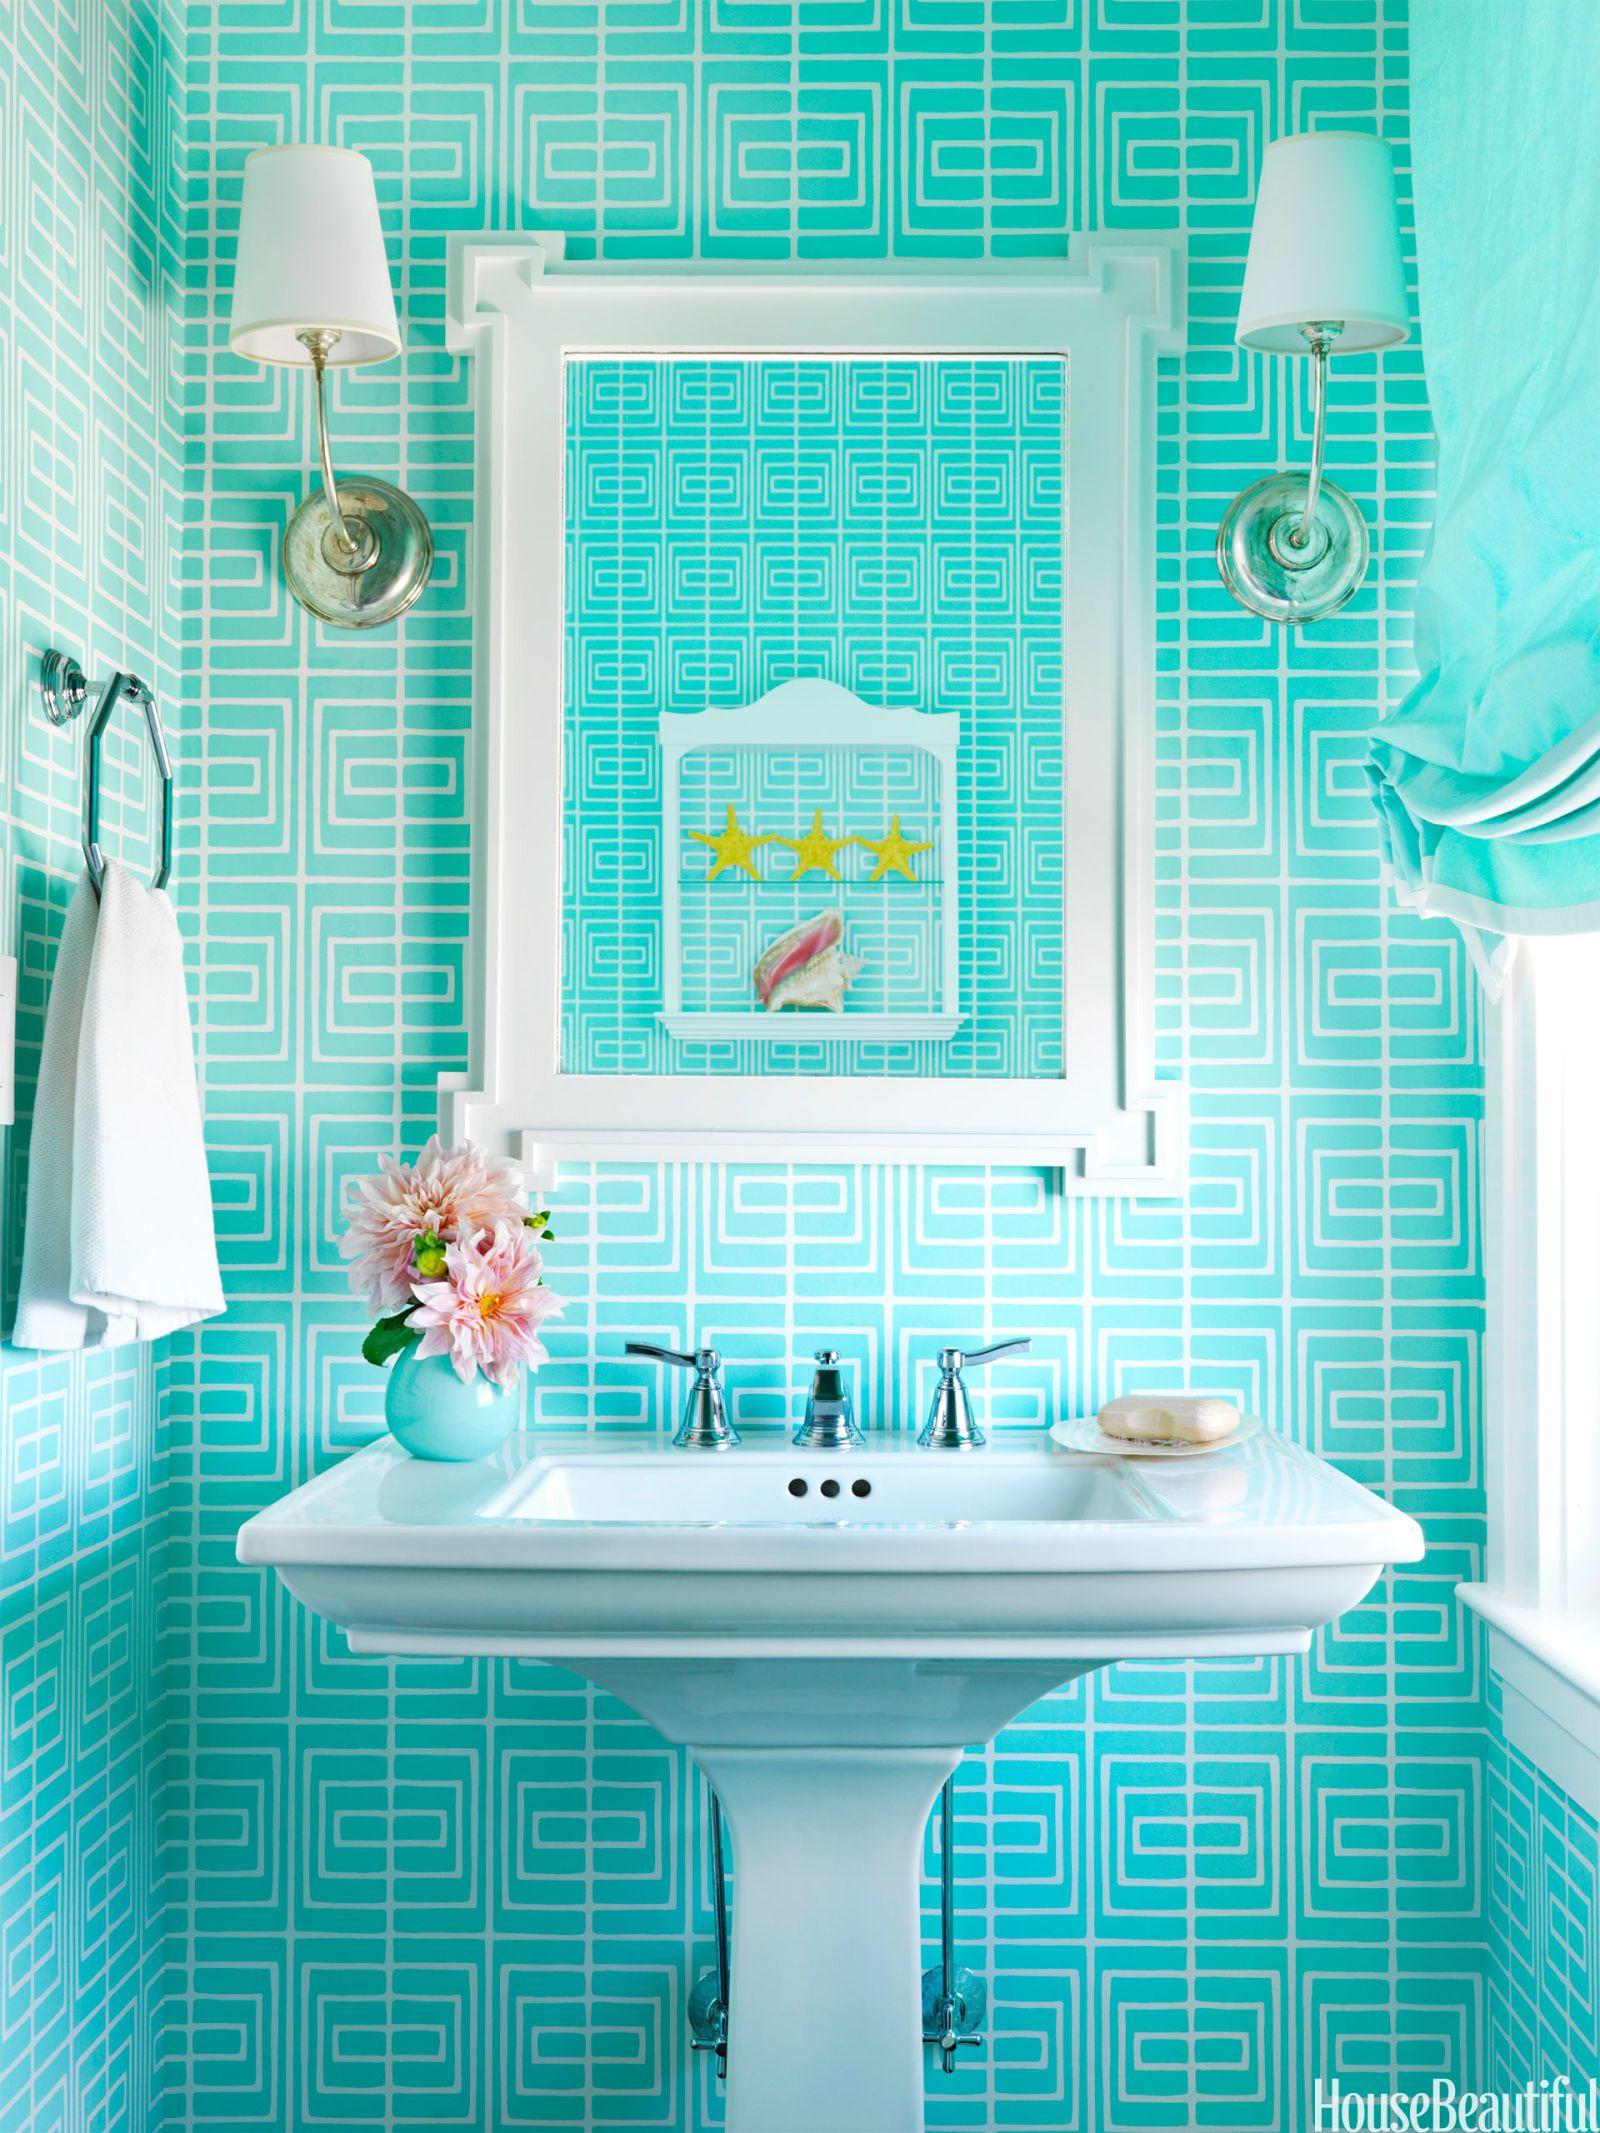 Room Color Schemes Paint And Interior Home Color Schemes House Beautiful Bathroom Design Unique Bathroom Bathroom Decor